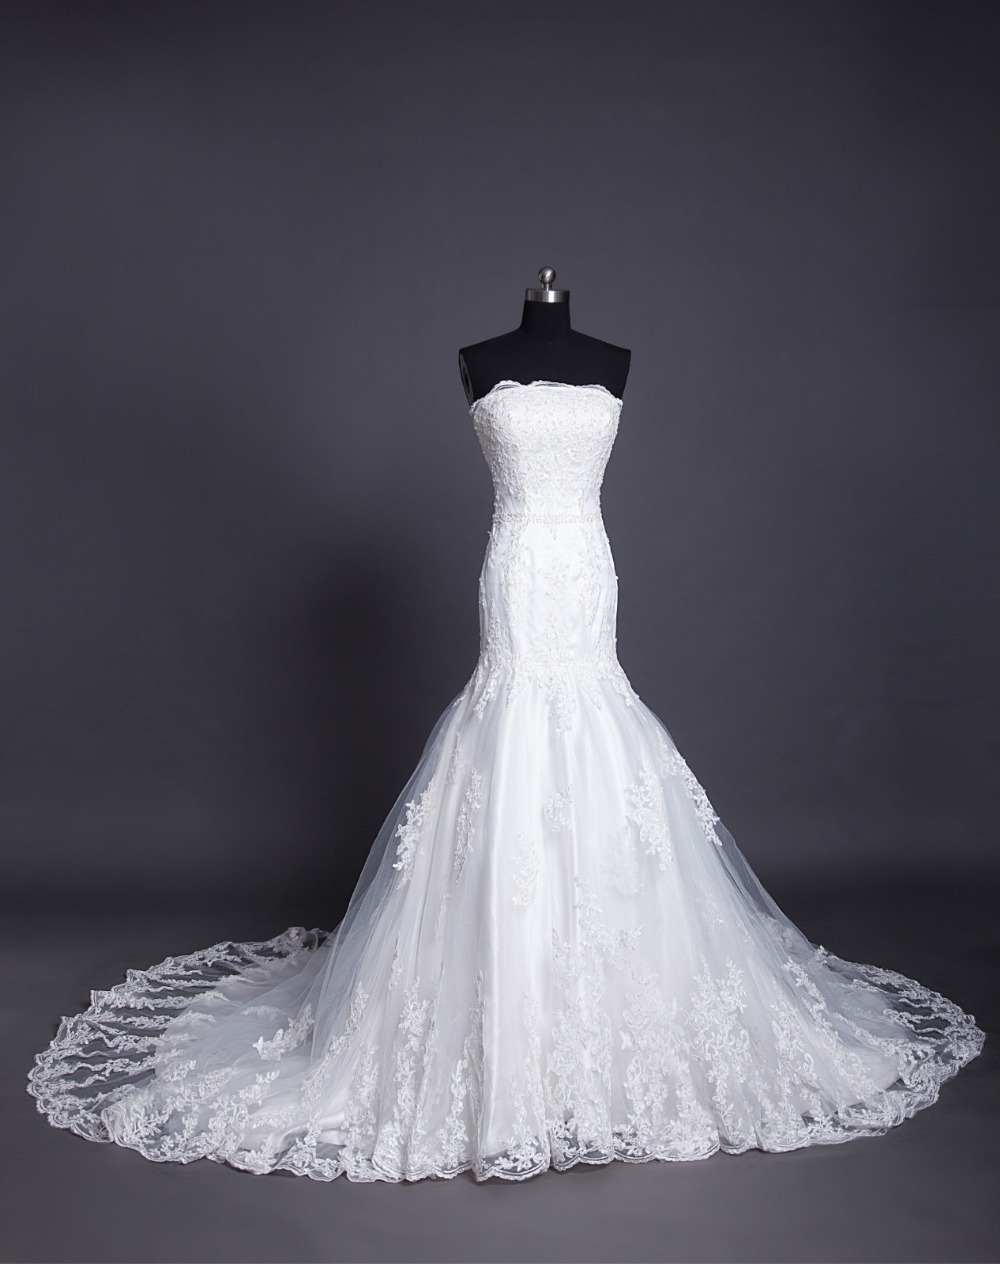 New Fashionable Bride Beading Vestido De Noiva 2016 Custom Sexy Long Casamento Lace Appliques A-line Wedding Dress Free Shipping